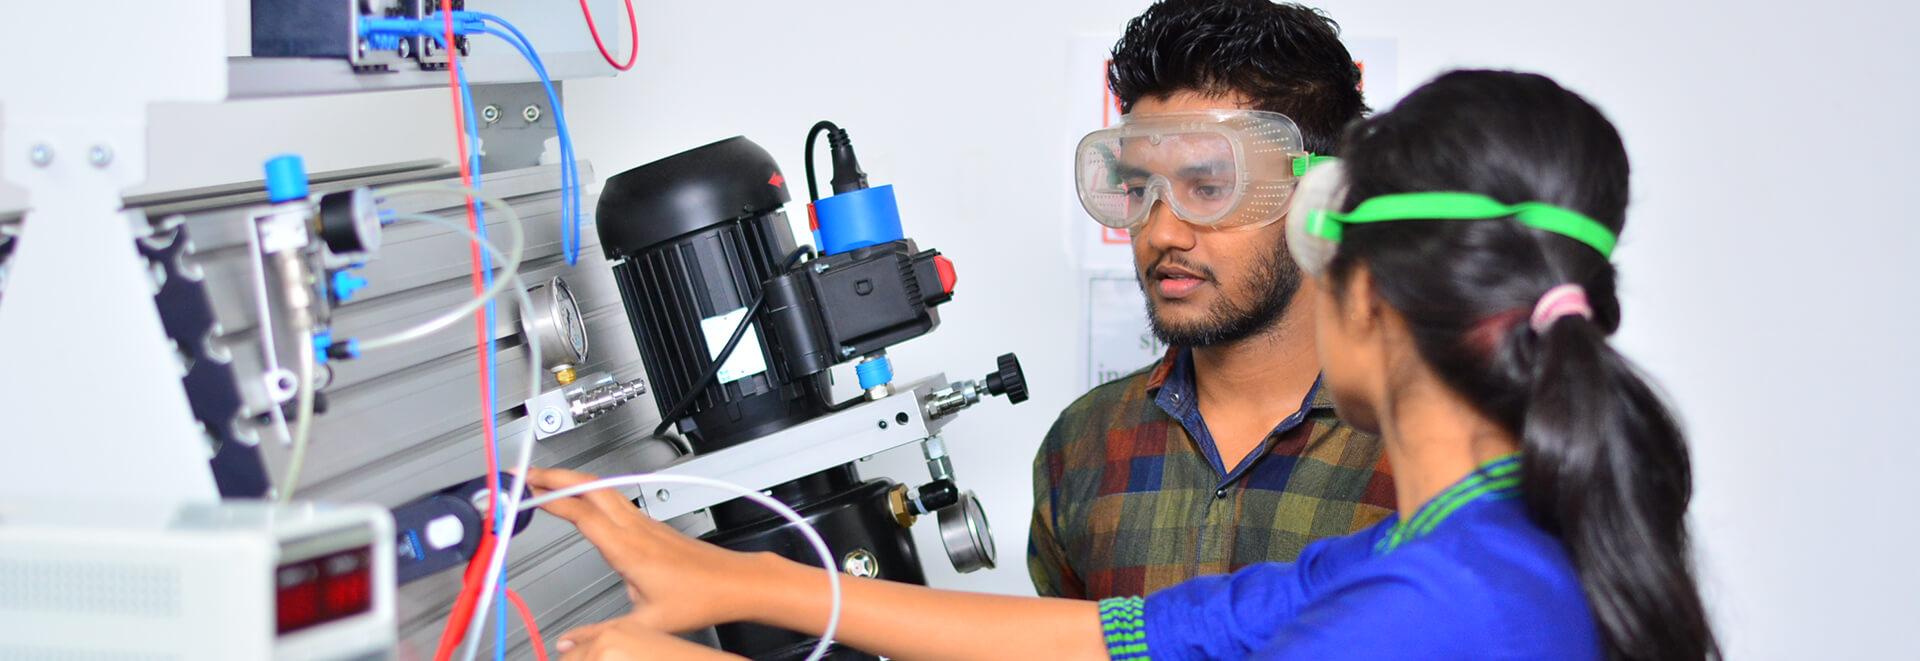 sliit-research-engineering-faculty-slider-1